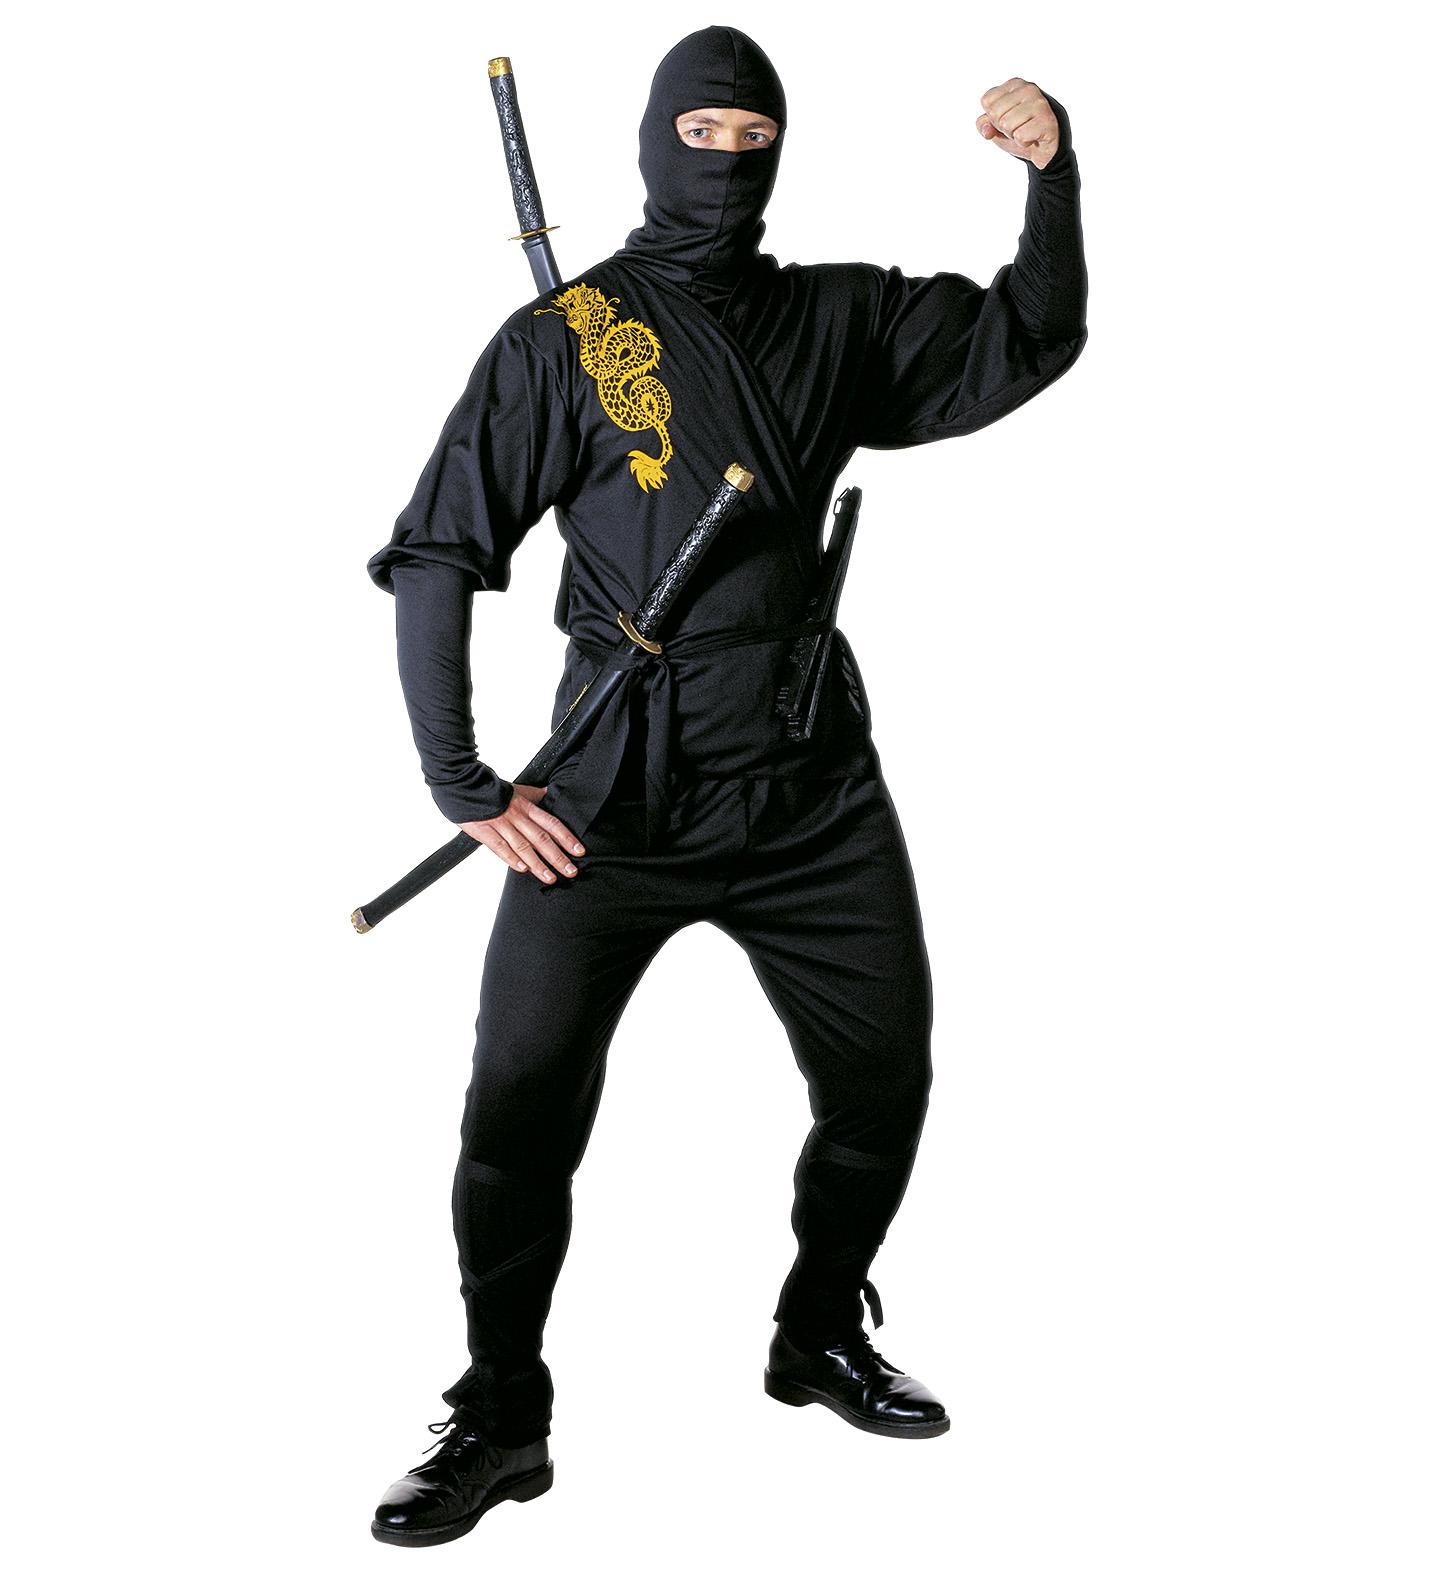 ninja kost m samurai verkleidung gr s scherzwelt. Black Bedroom Furniture Sets. Home Design Ideas